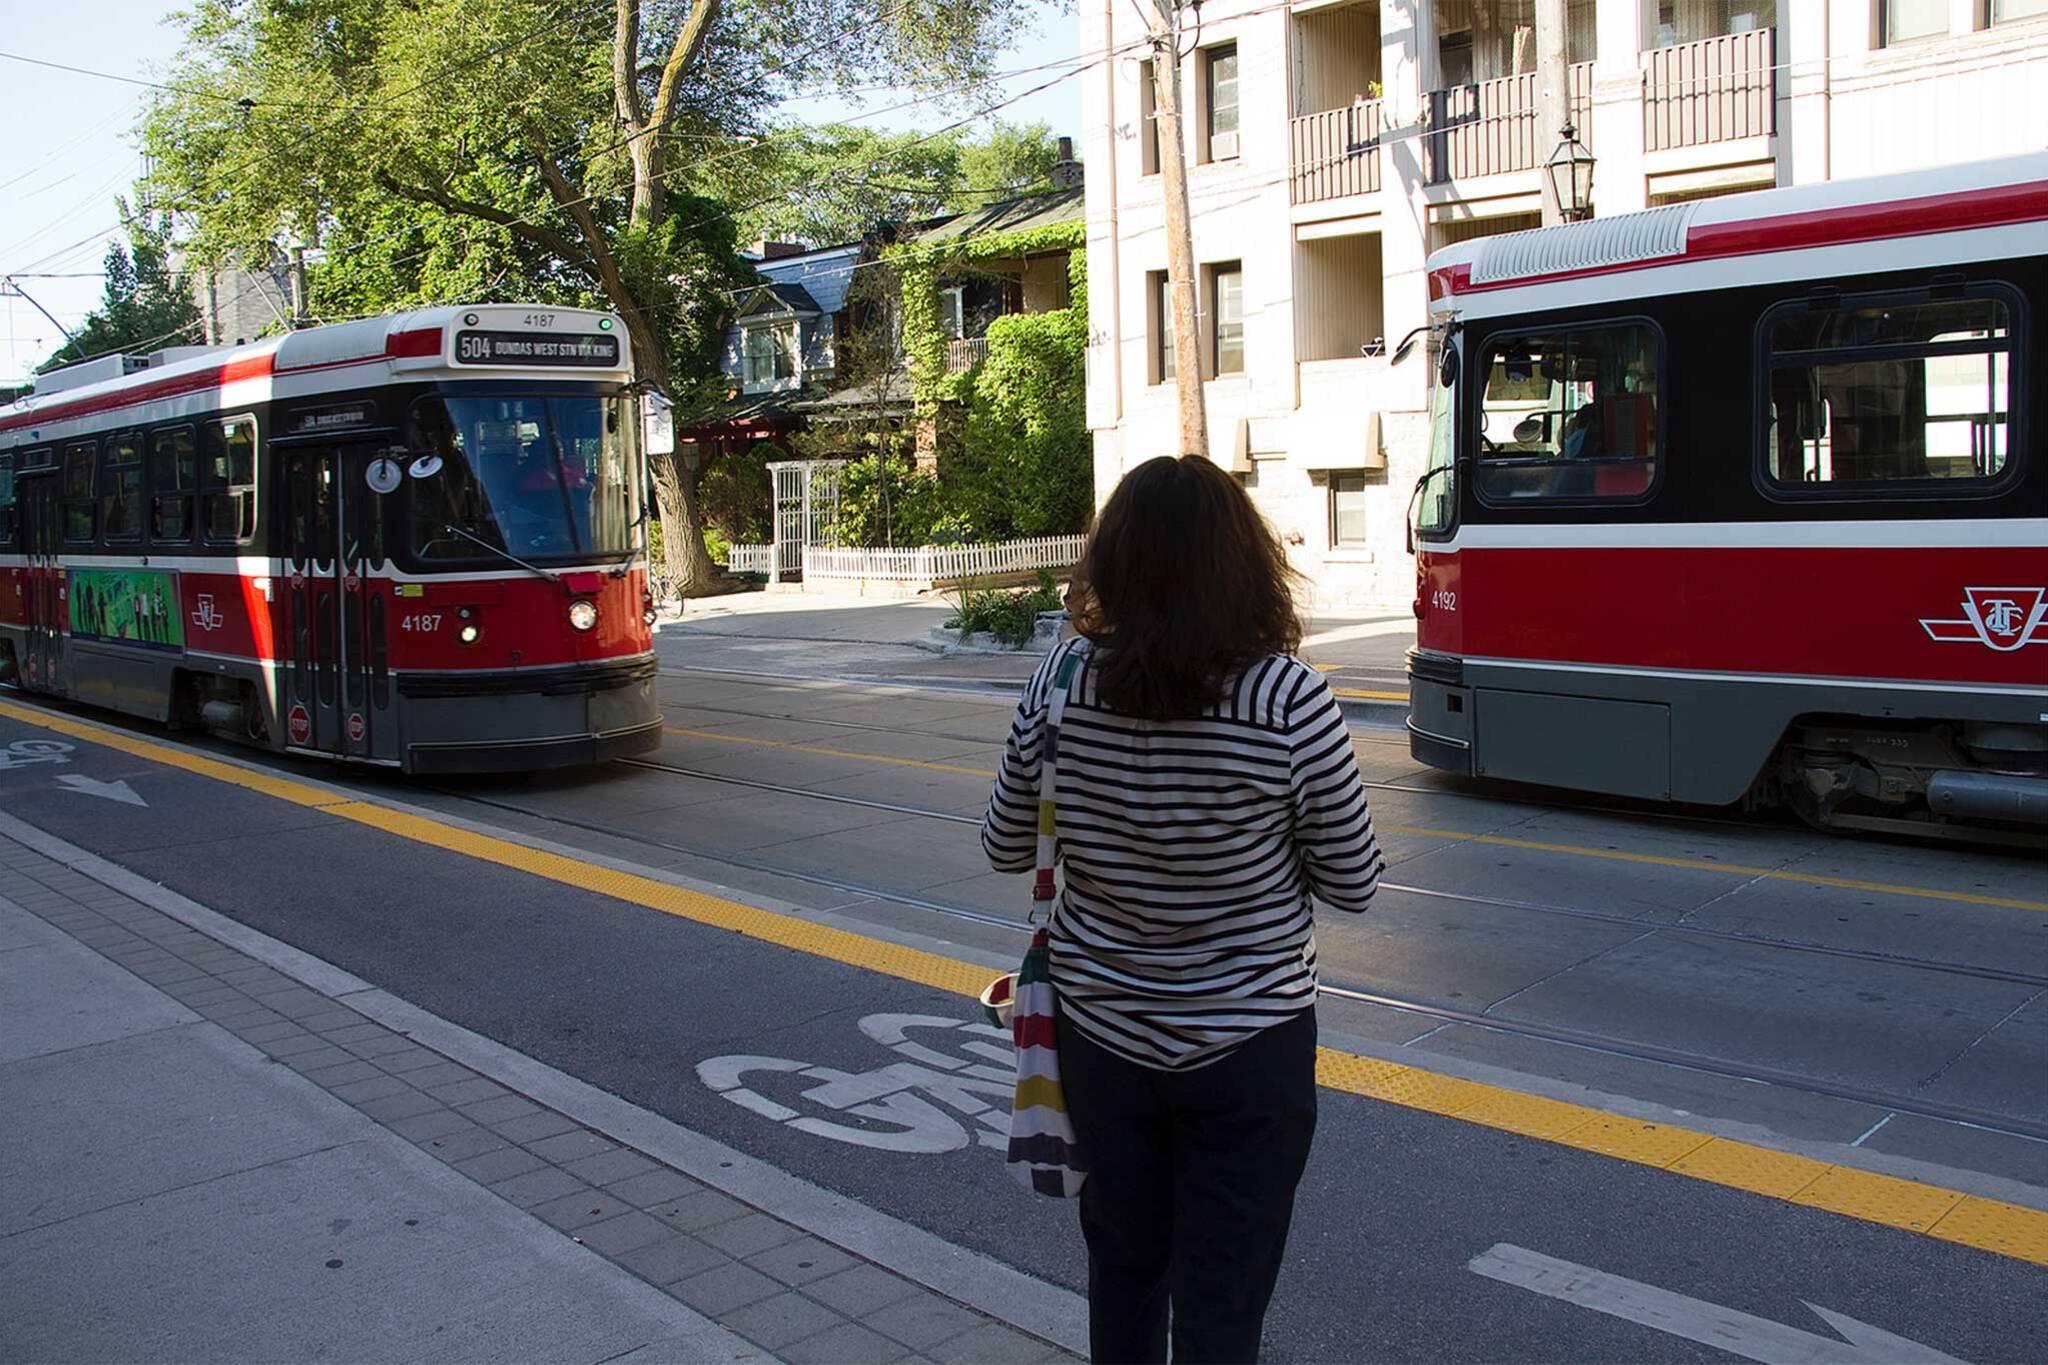 roncesvalles streetcar